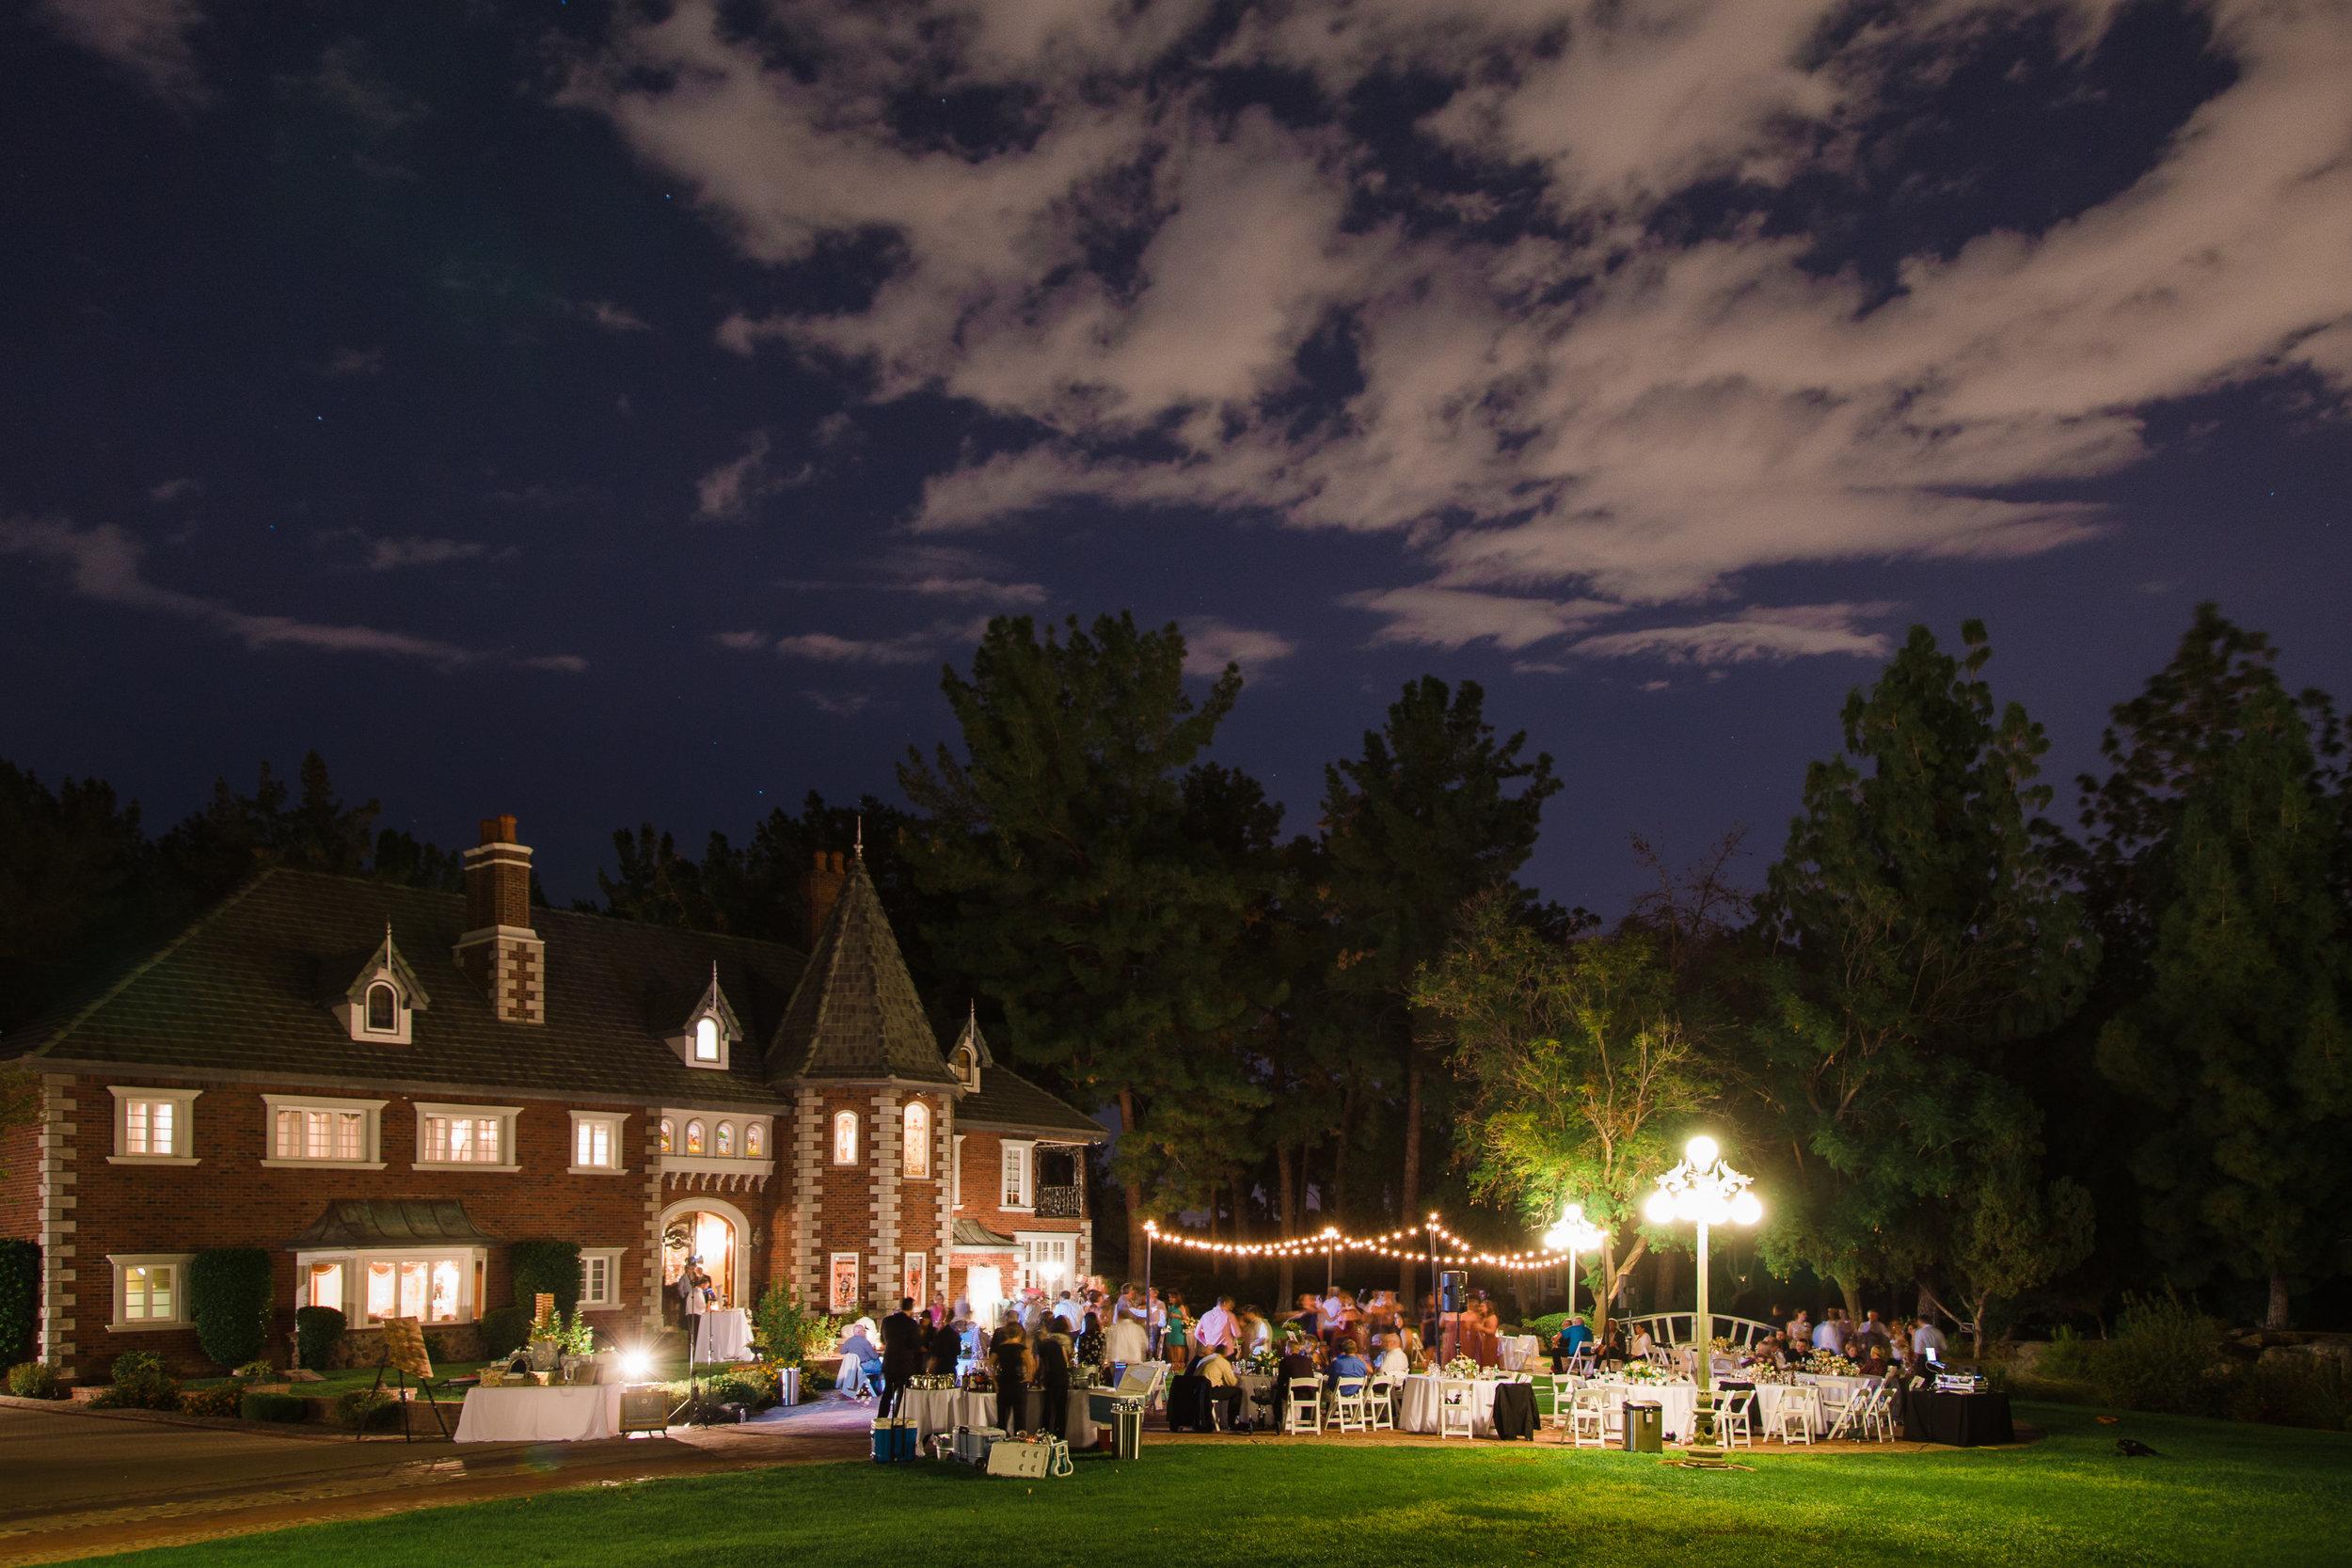 Chateau de Vie wedding, night reception